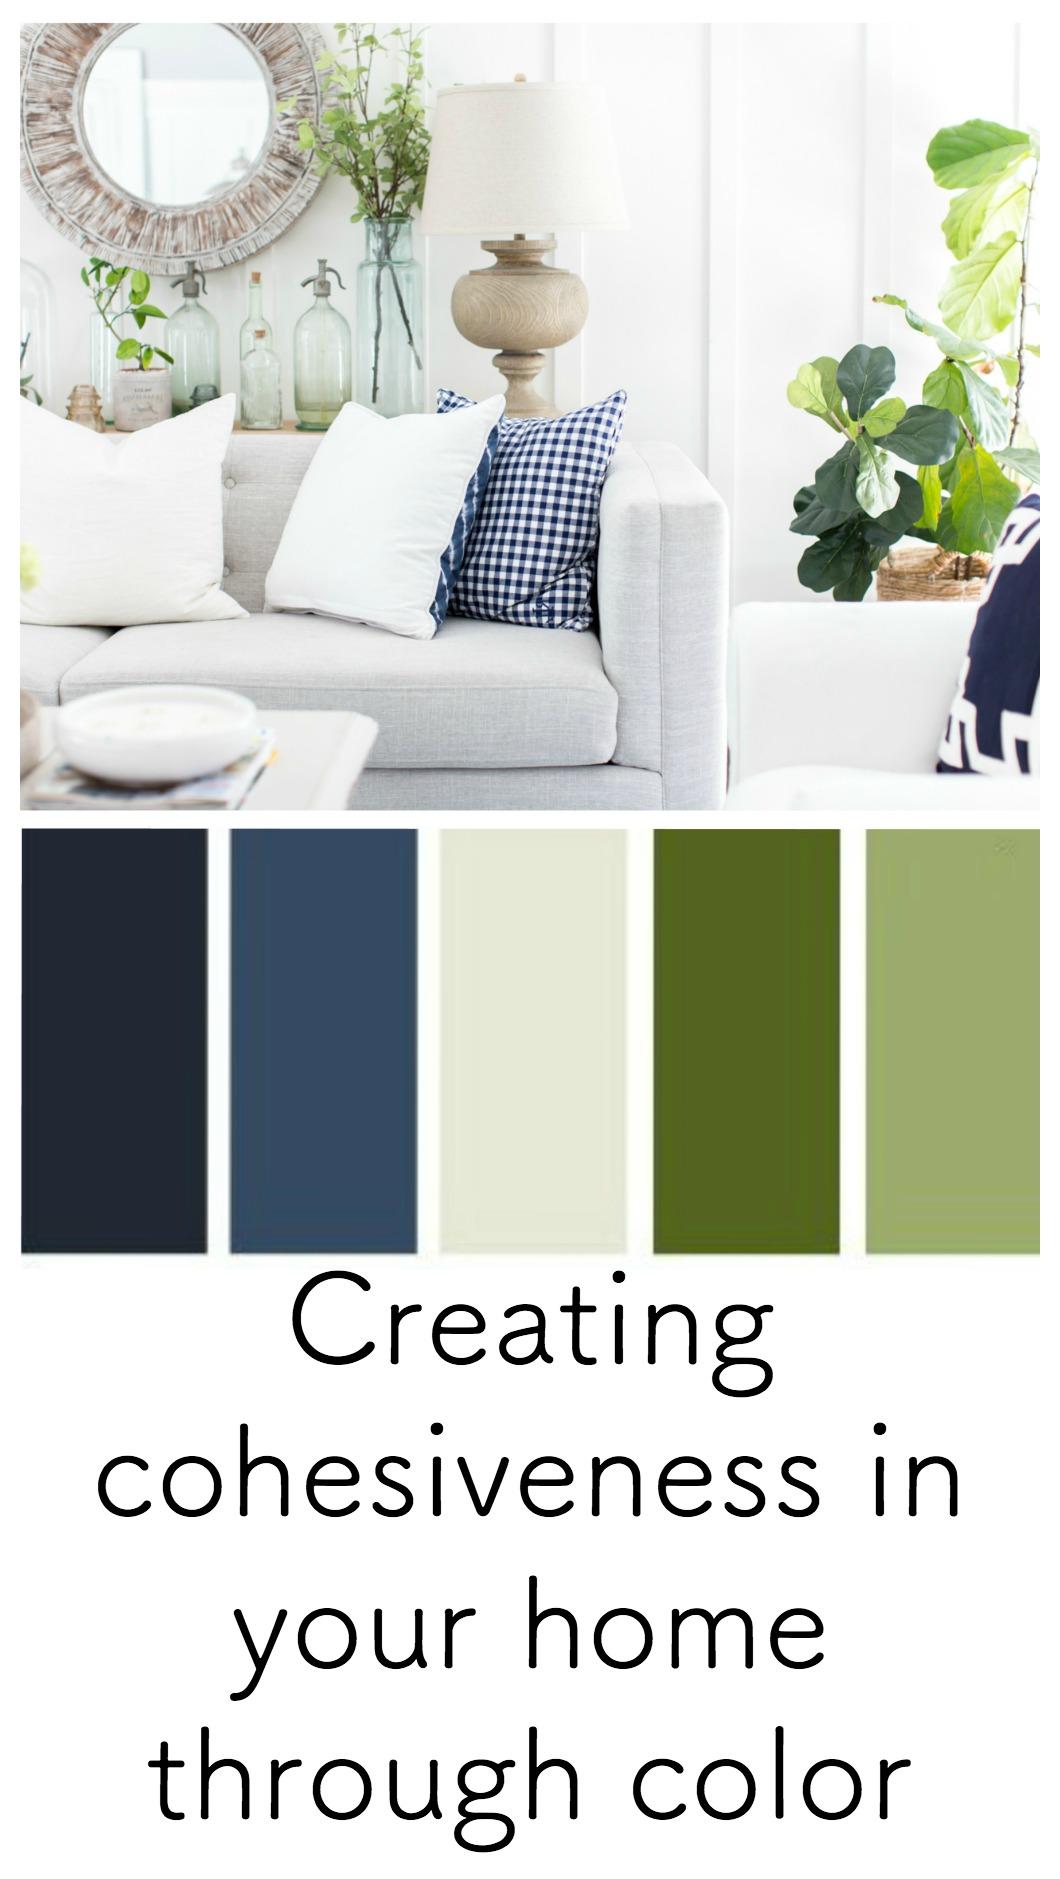 creatingcohesivenessthroughcolor